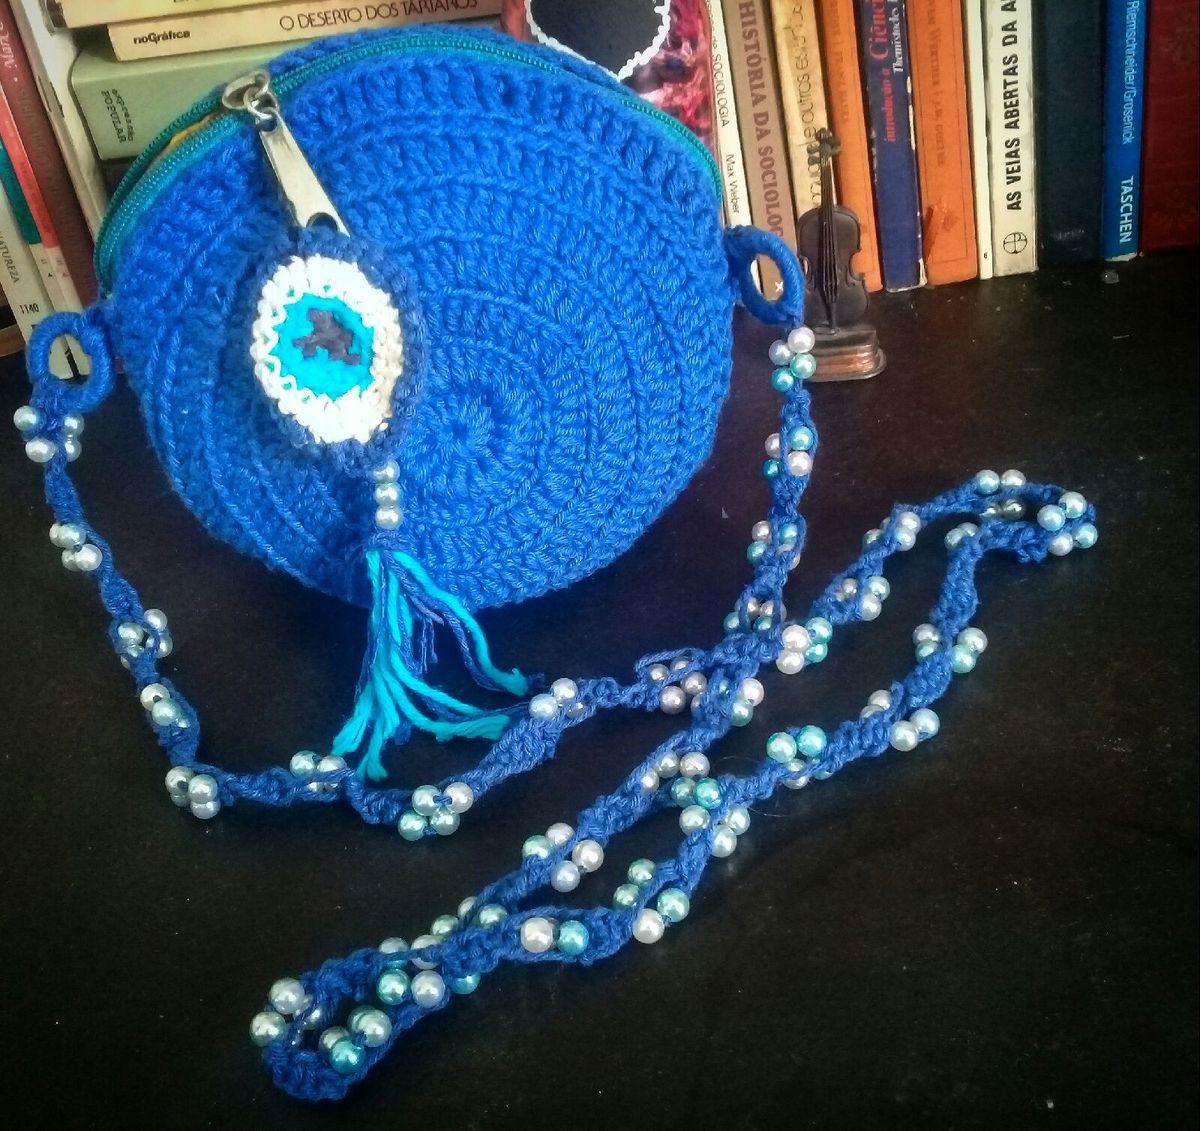 62b9b52a183 bolsa redonda azul em crochê - ombro sem marca.  Czm6ly9wag90b3muzw5qb2vplmnvbs5ici9wcm9kdwn0cy82ndywnzqvmgiymtc0yzllothiywm3zwmxzmi3zjiwnwq3ogjintauanbn